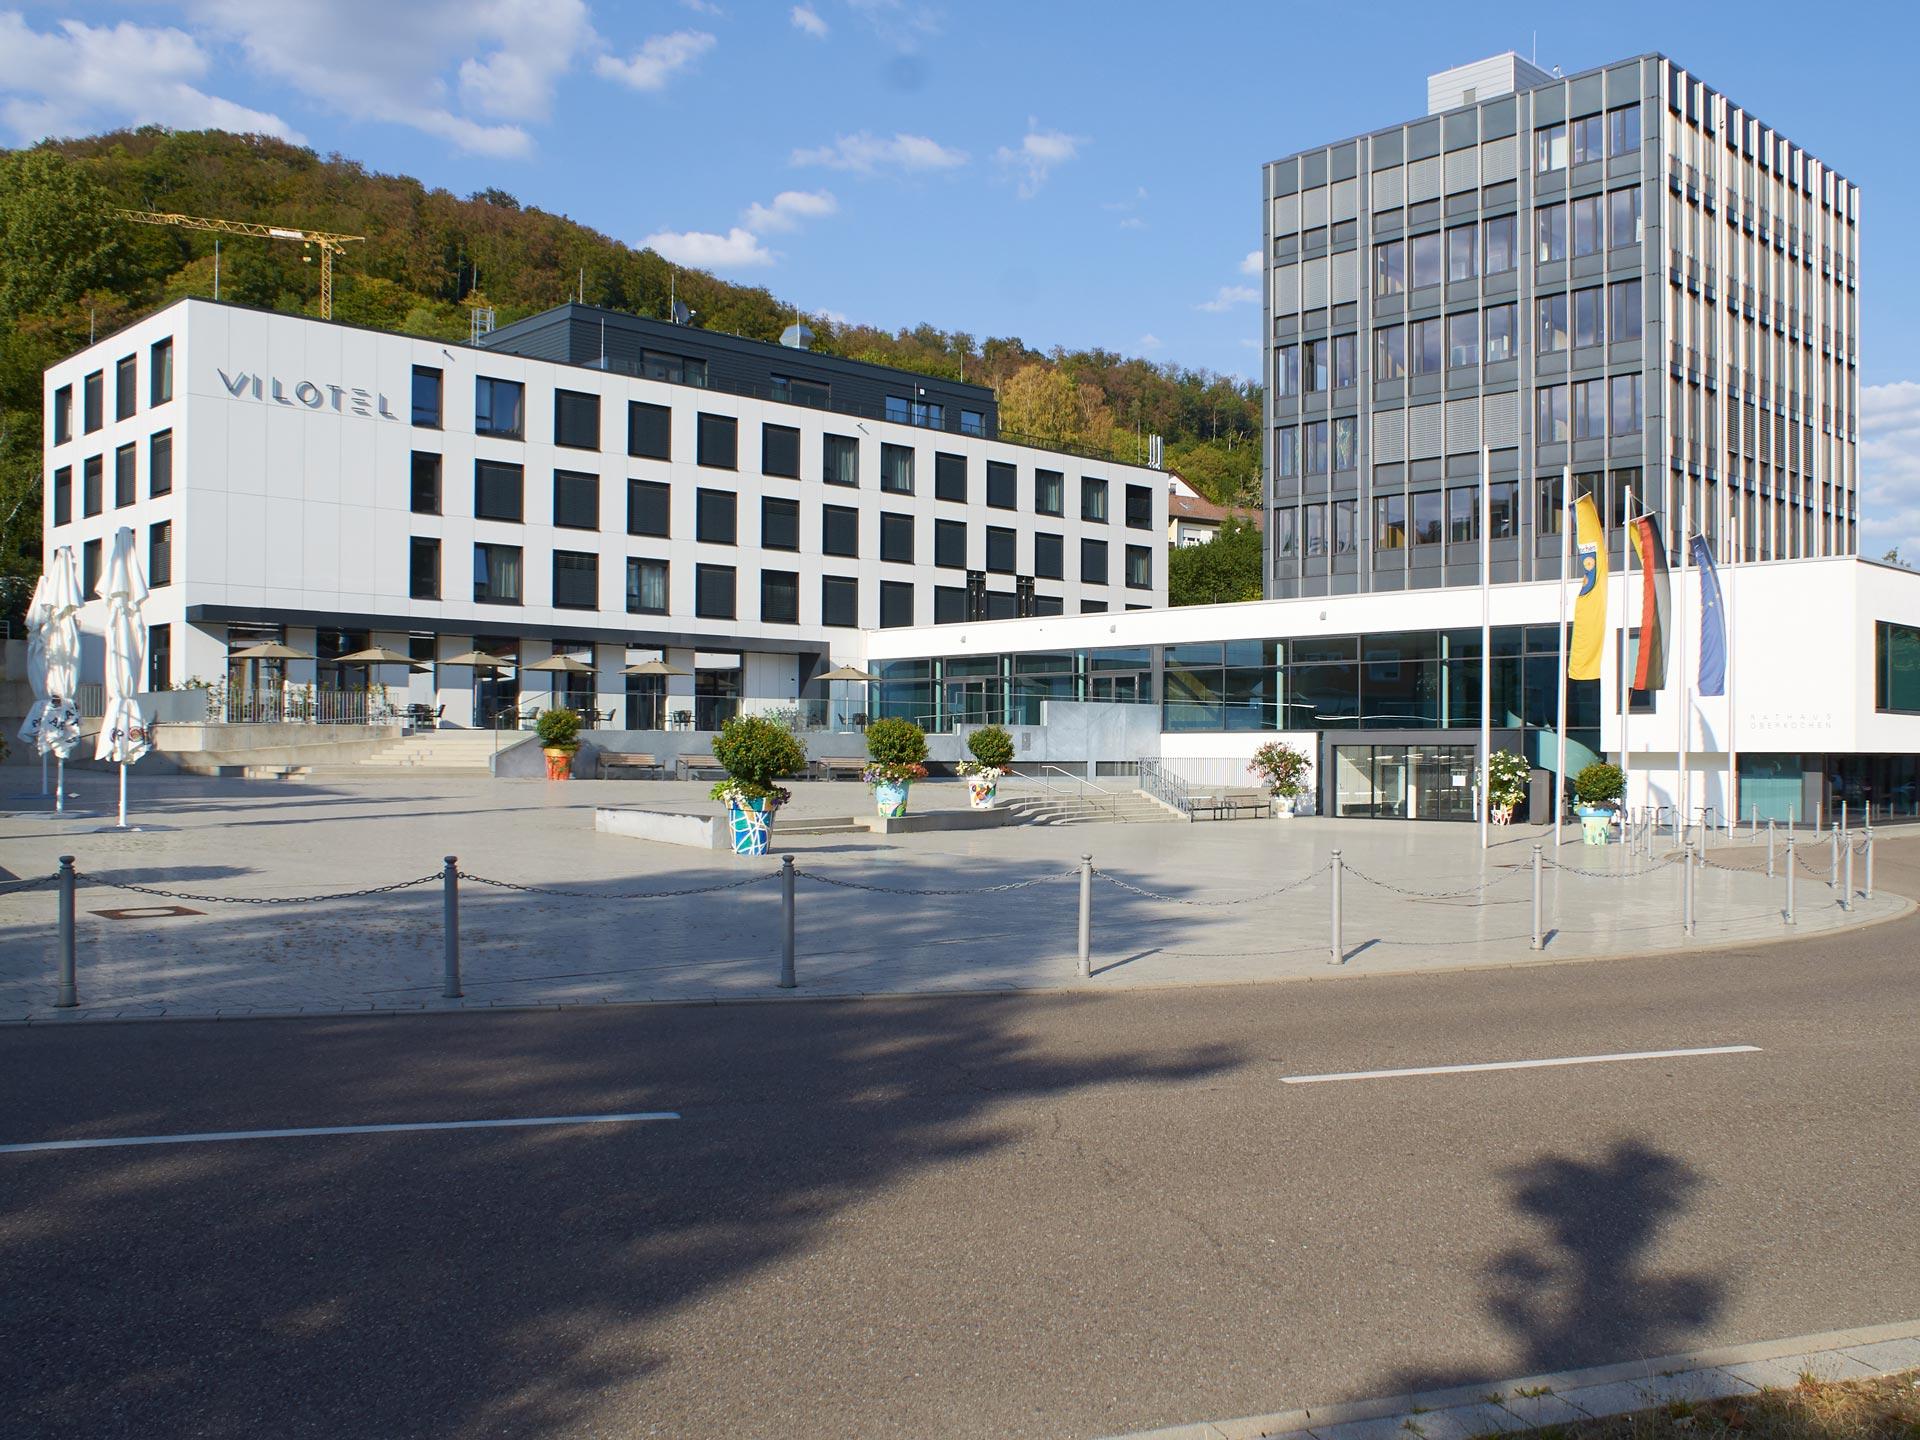 Vilotel Hotel am Rathaus